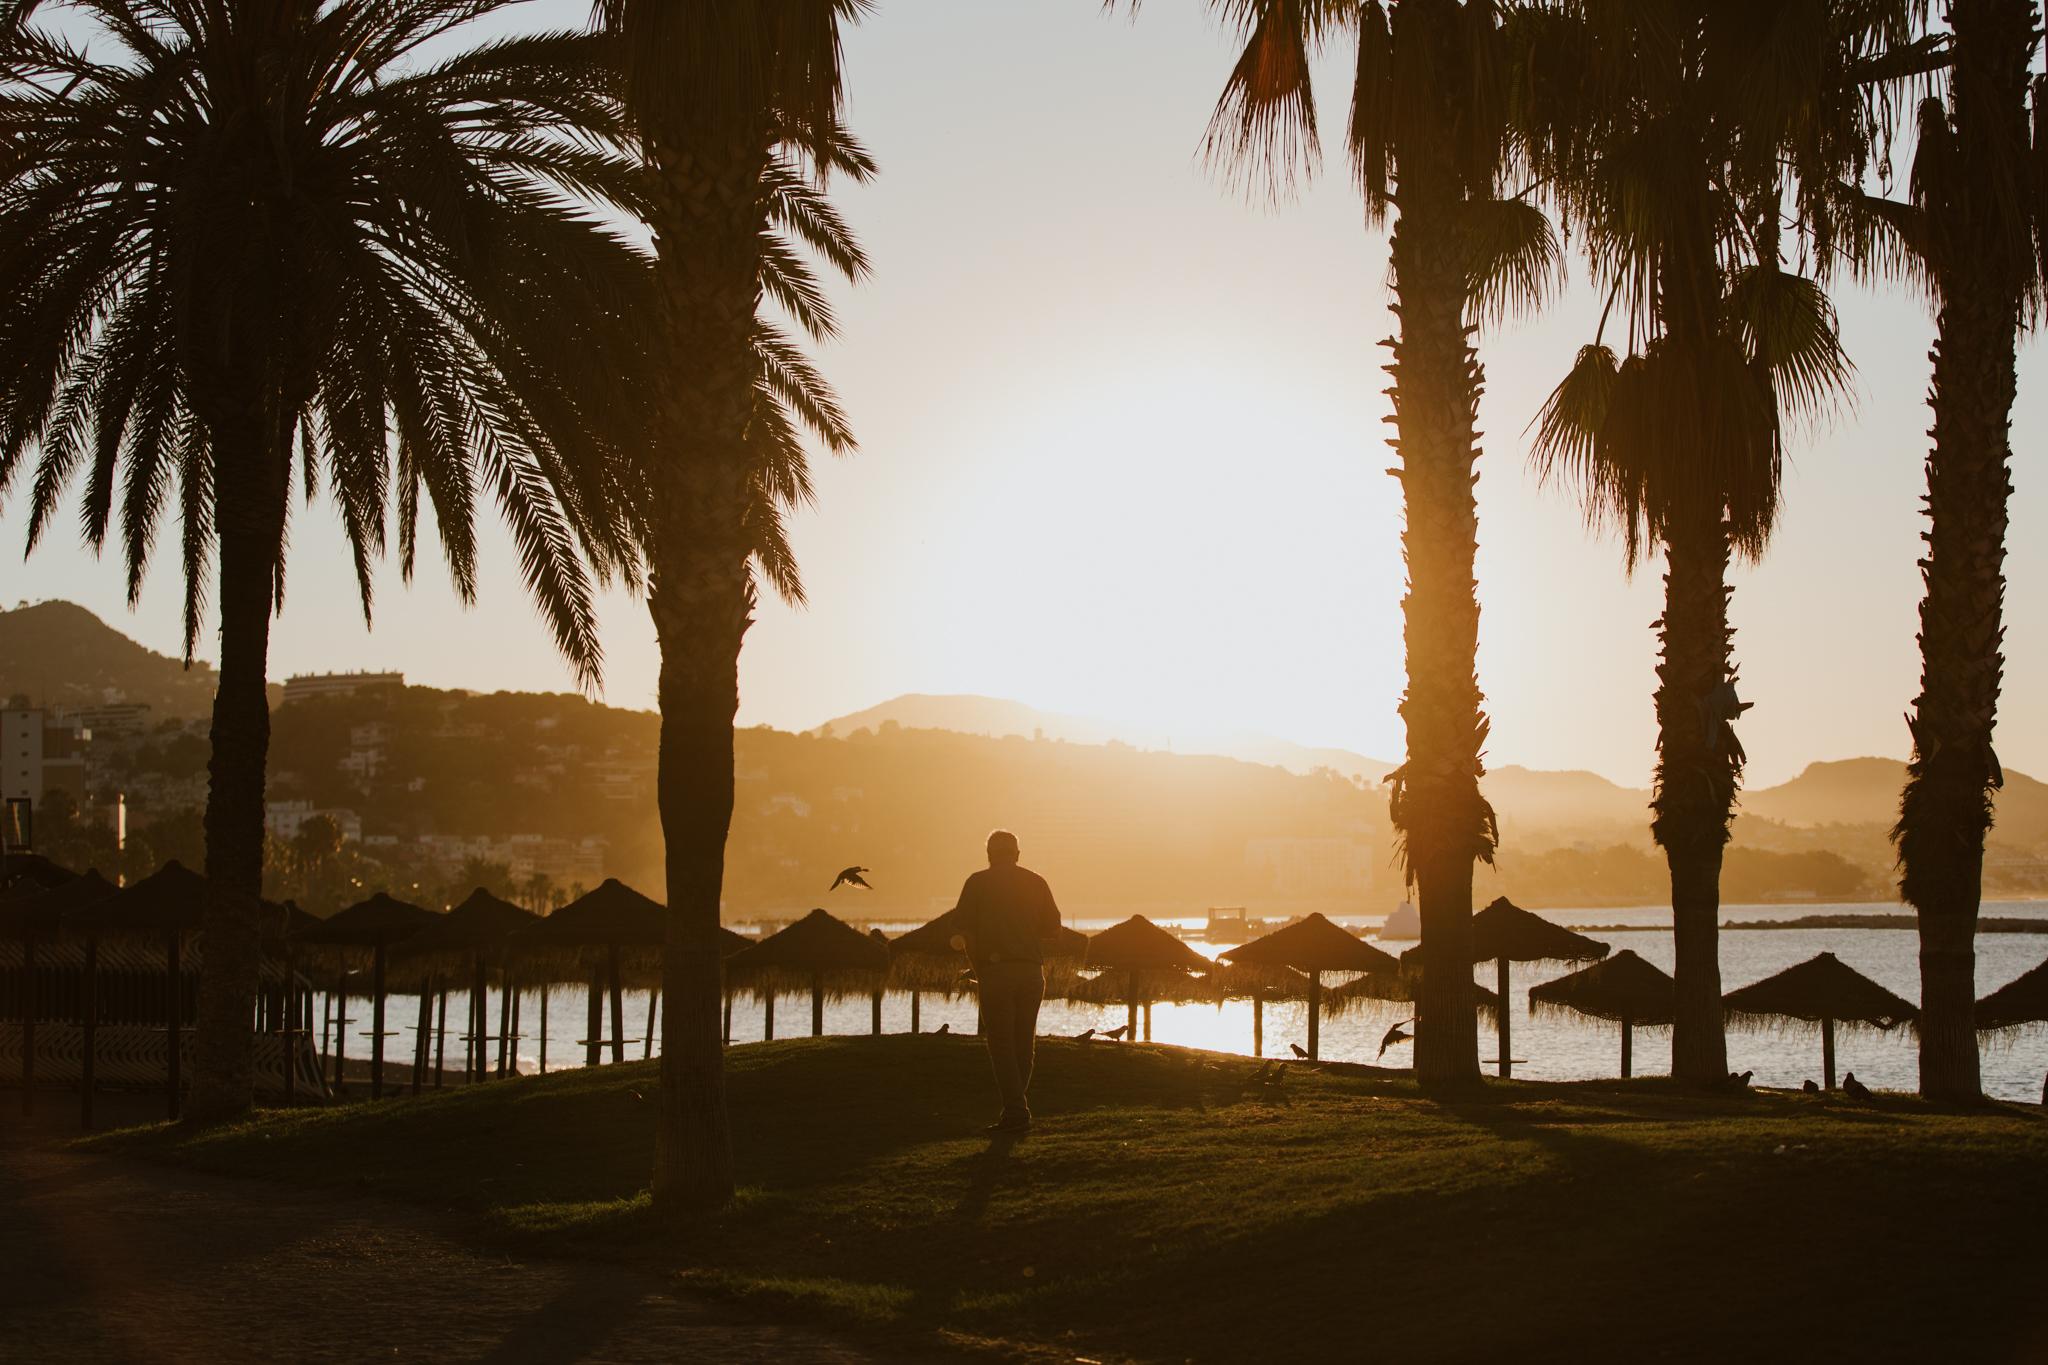 Natalie Skoric - Spain Travel Photography